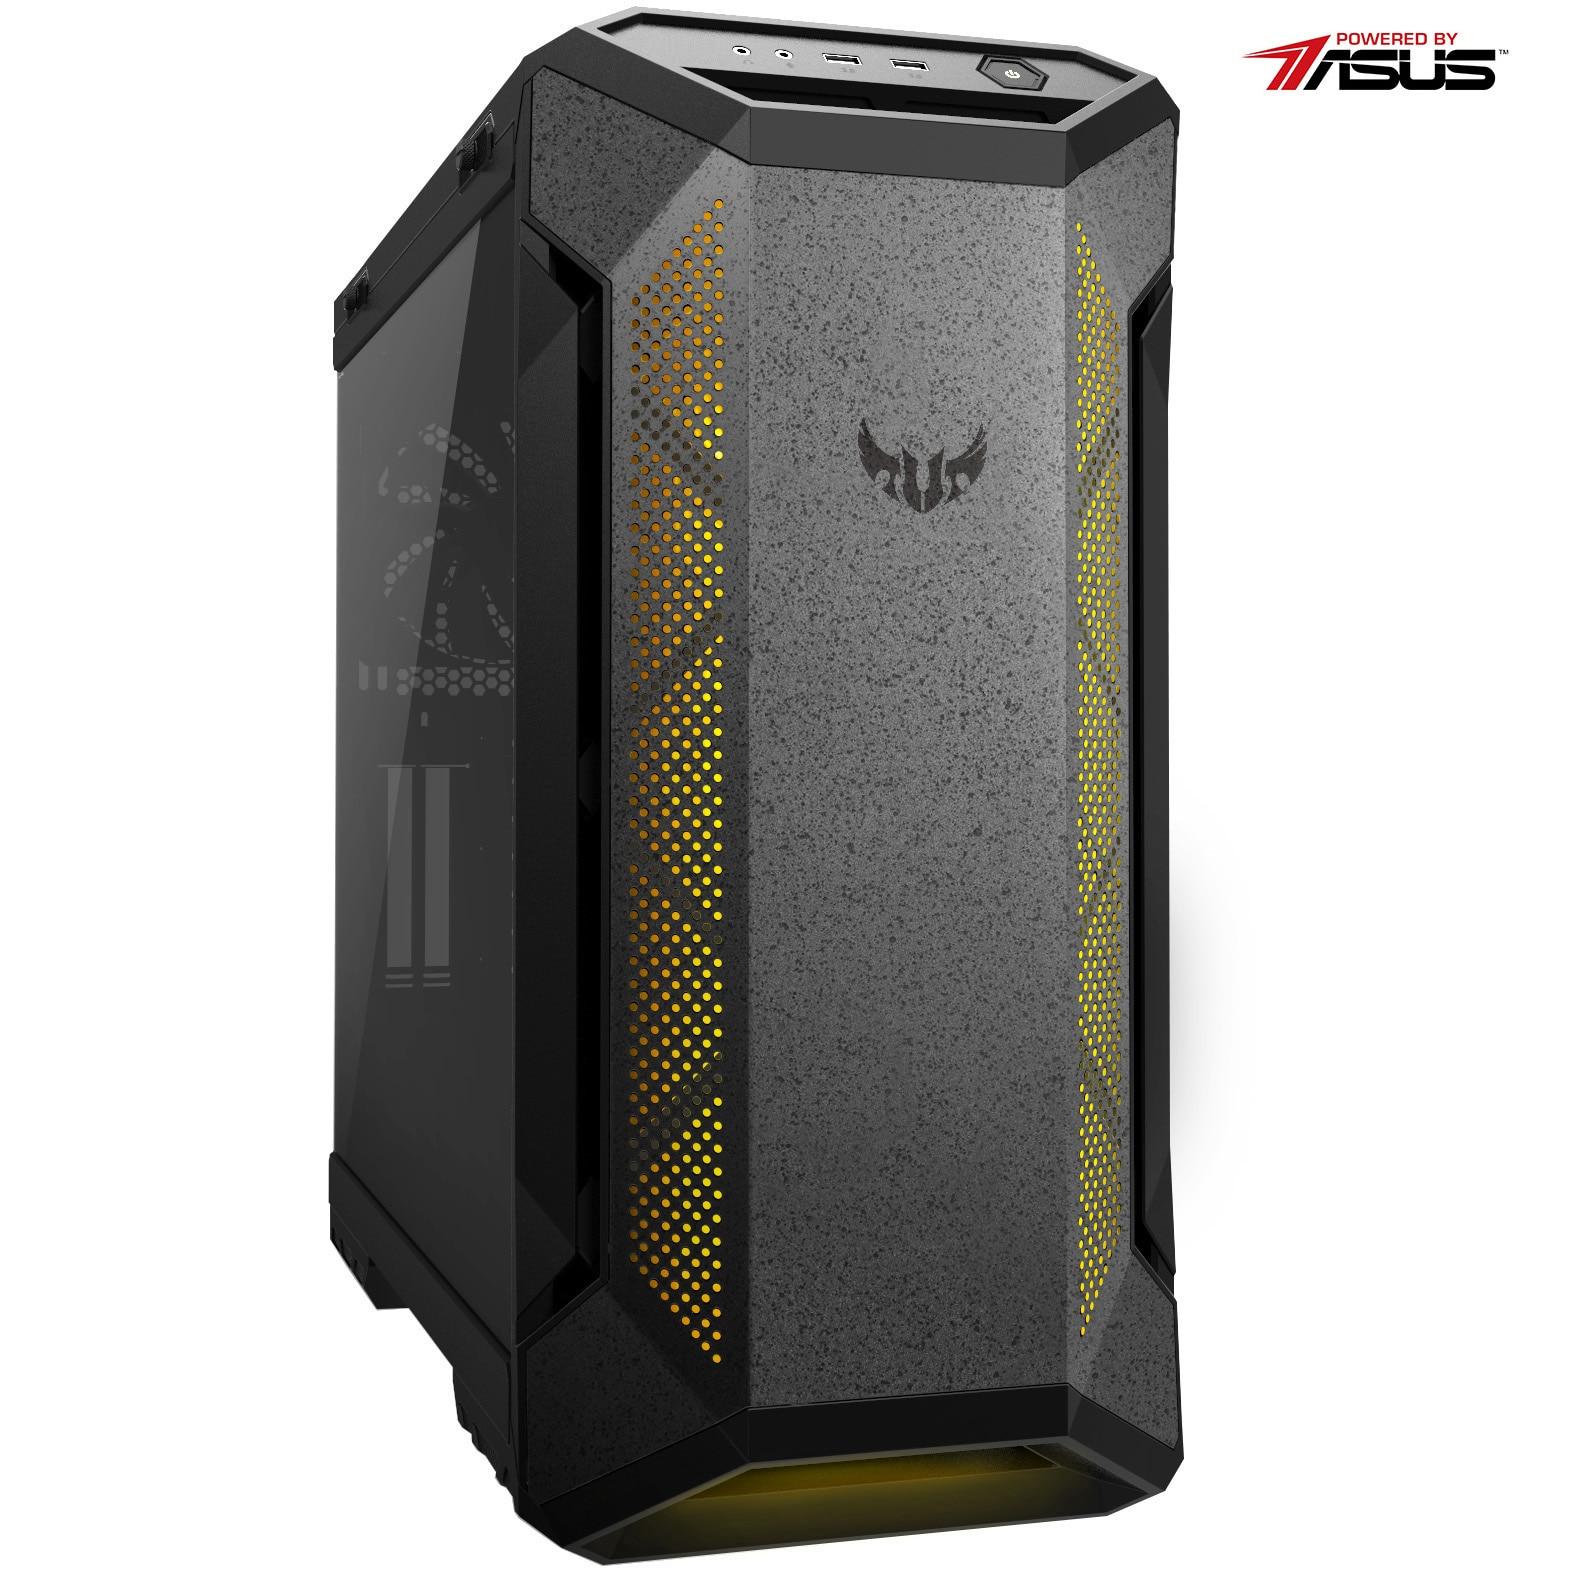 Fotografie Sistem Desktop PC Gaming Serioux Powered by ASUS cu procesor AMD Ryzen™ 5 5600X pana la 4.60GHz, 16GB DDR4, 1TB SSD, GeForce® RTX 3060 12GB GDDR6, Microsoft Windows 10 Home